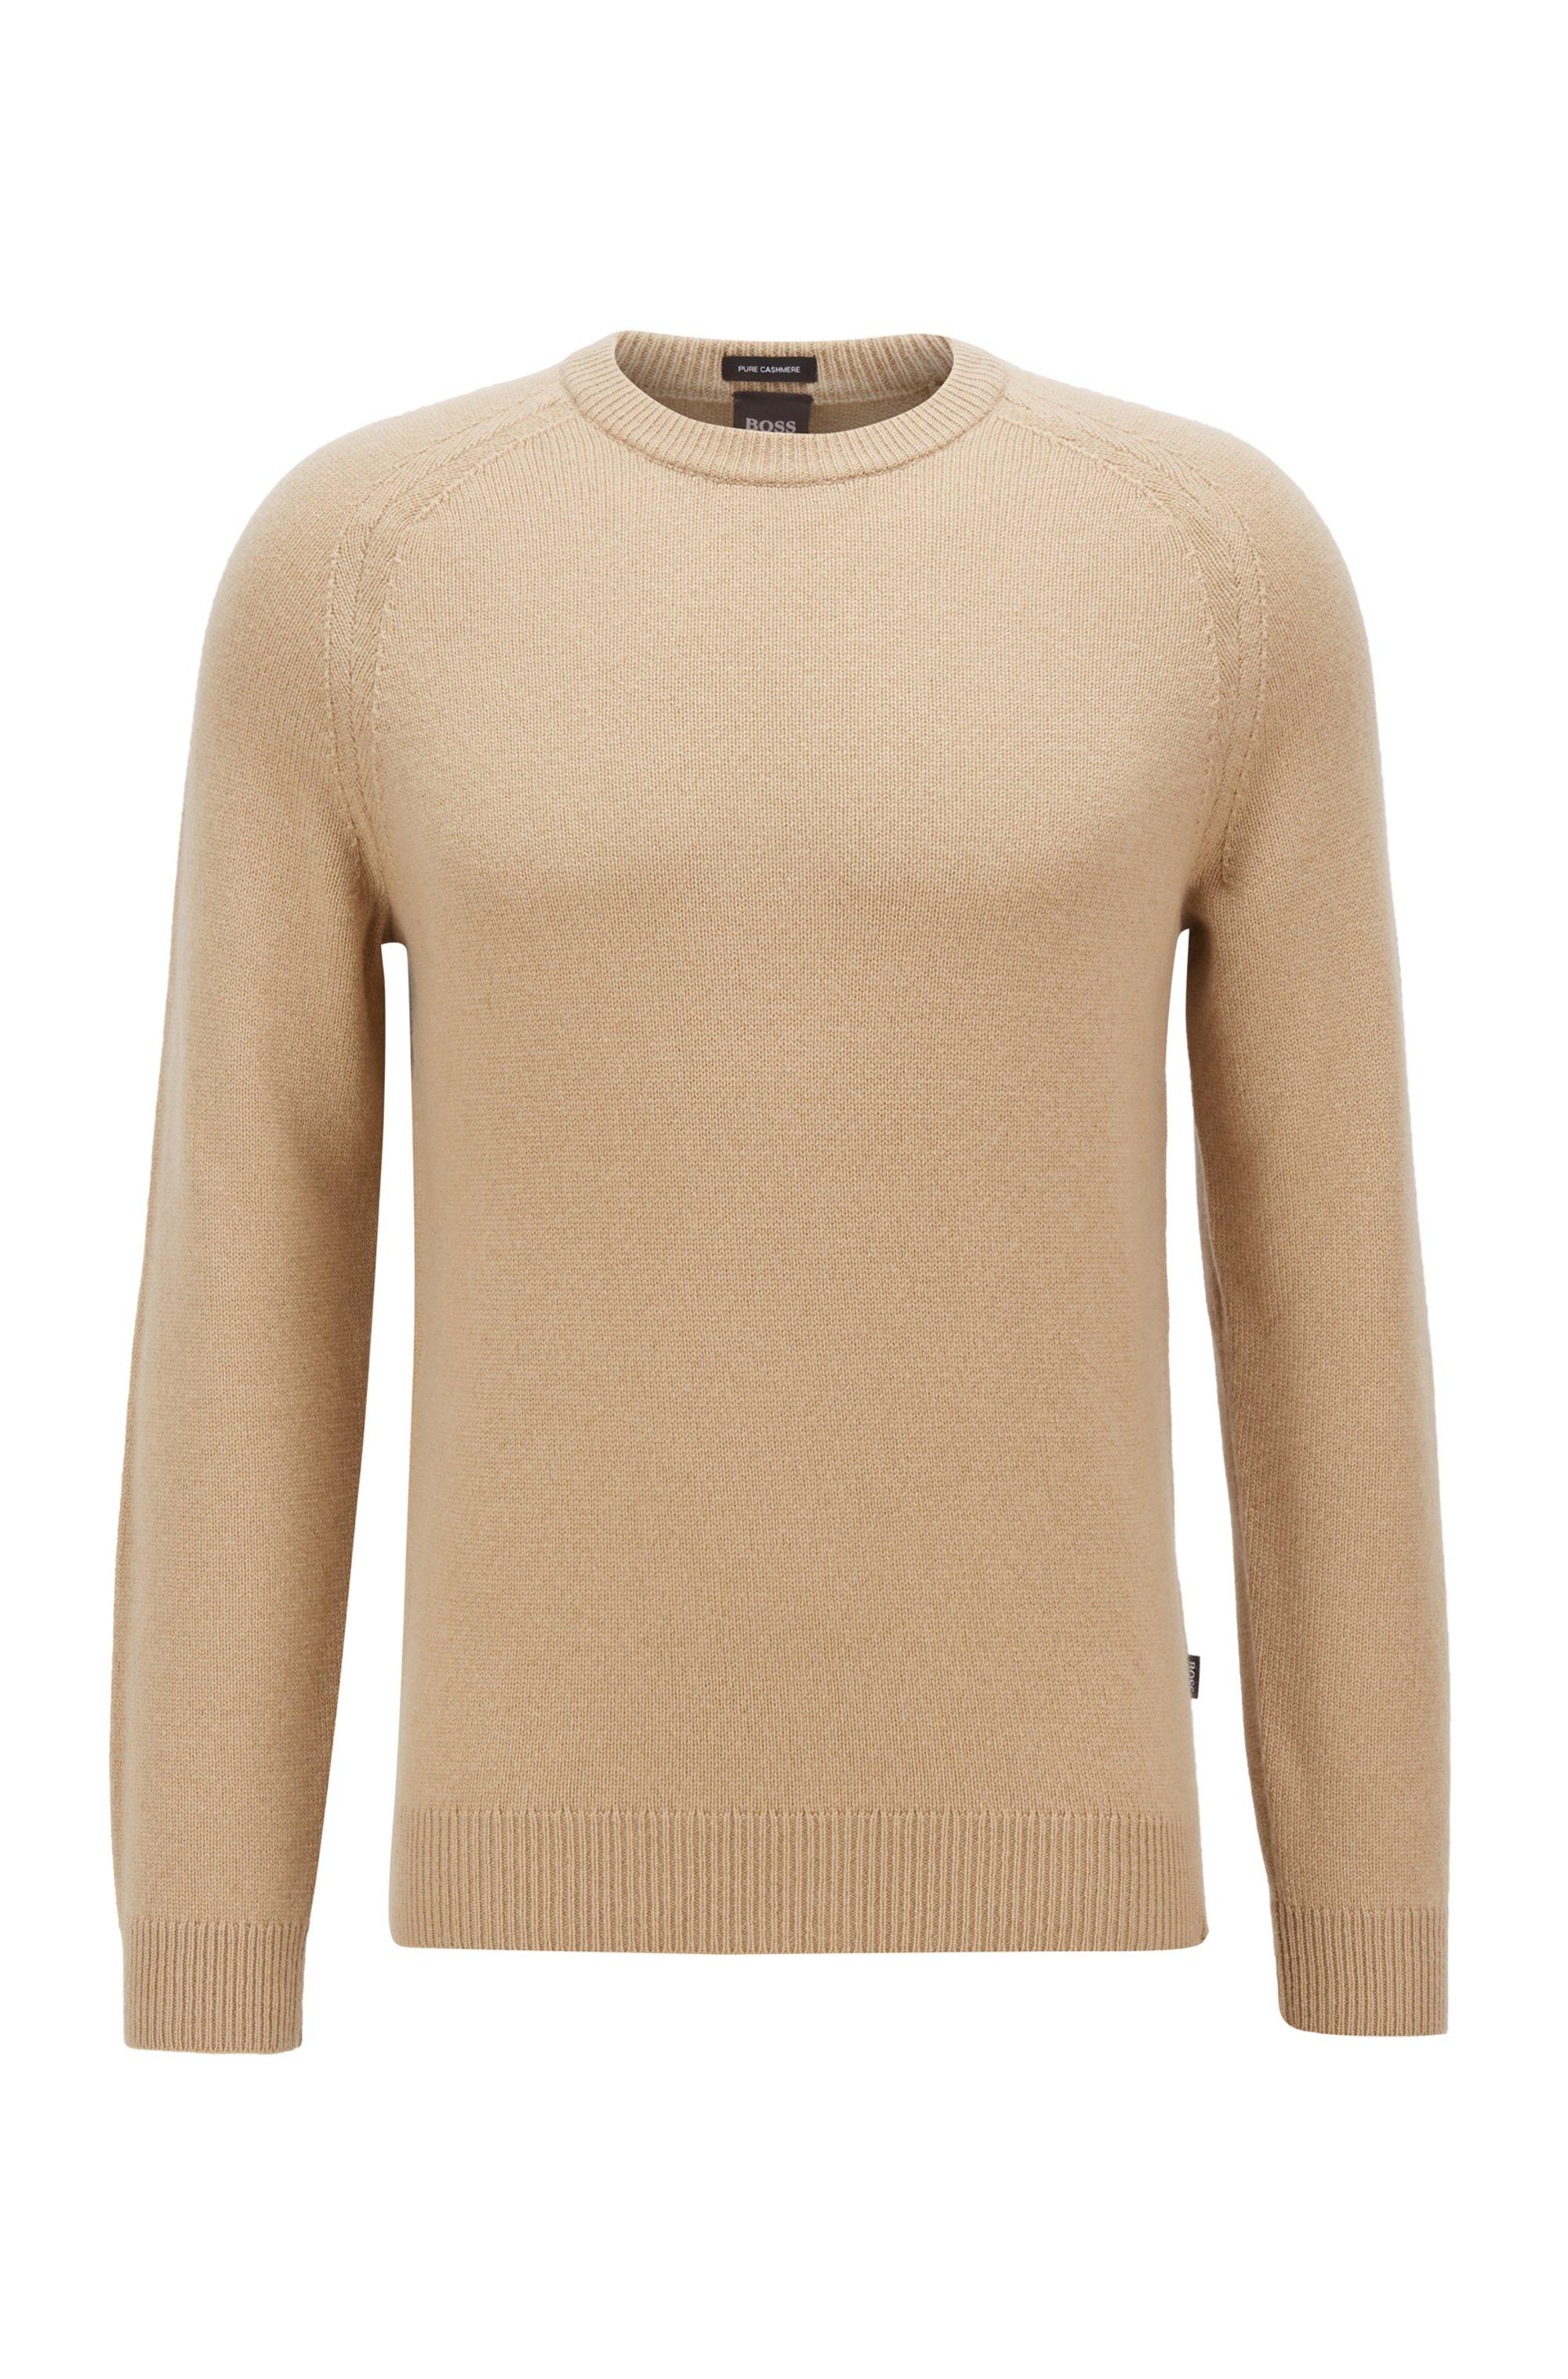 Regular-fit sweater in pure cashmere, Light Beige